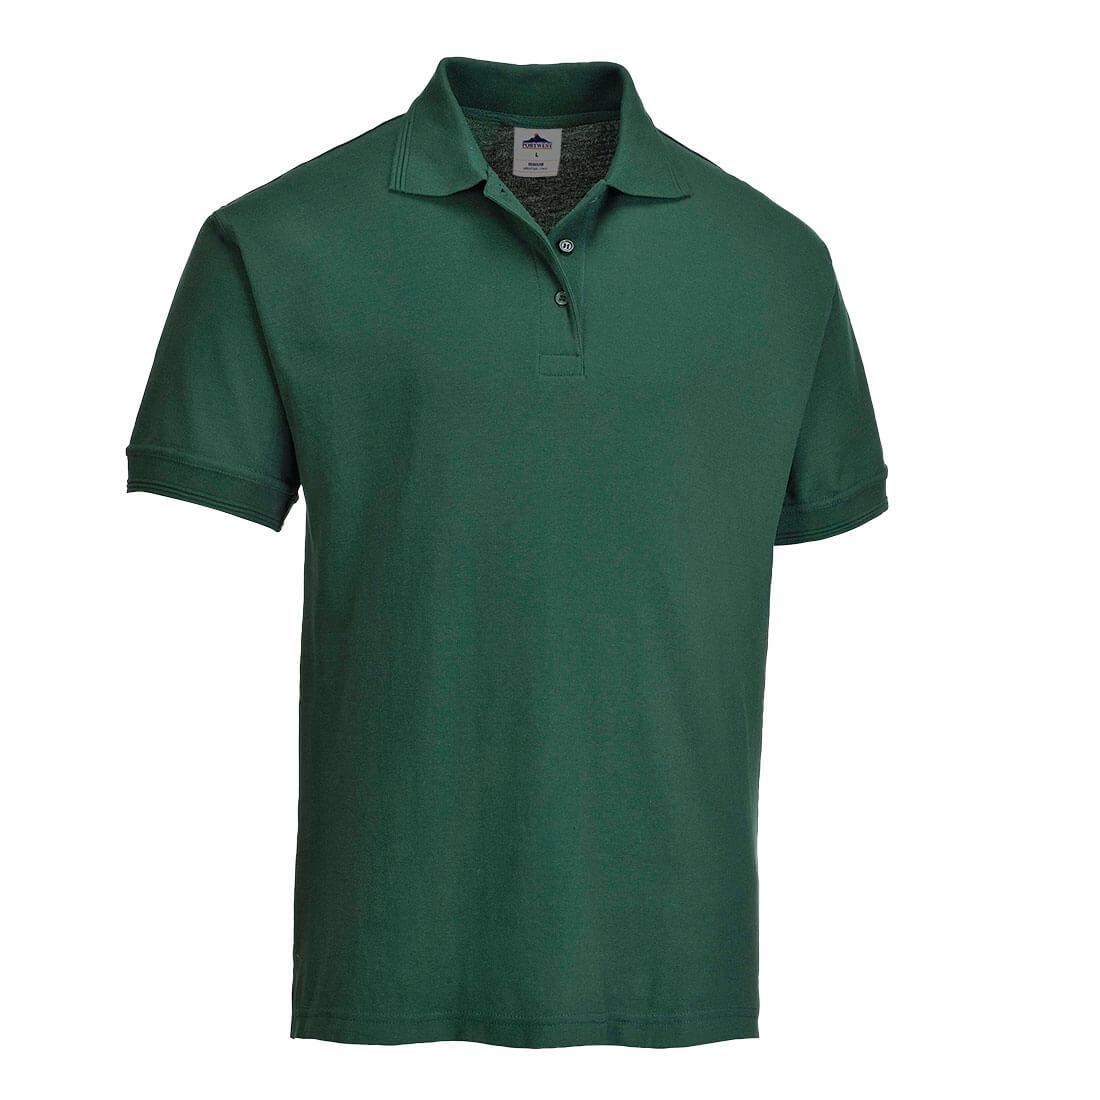 Portwest Ladies Naples Polo Shirt Bottle Green S